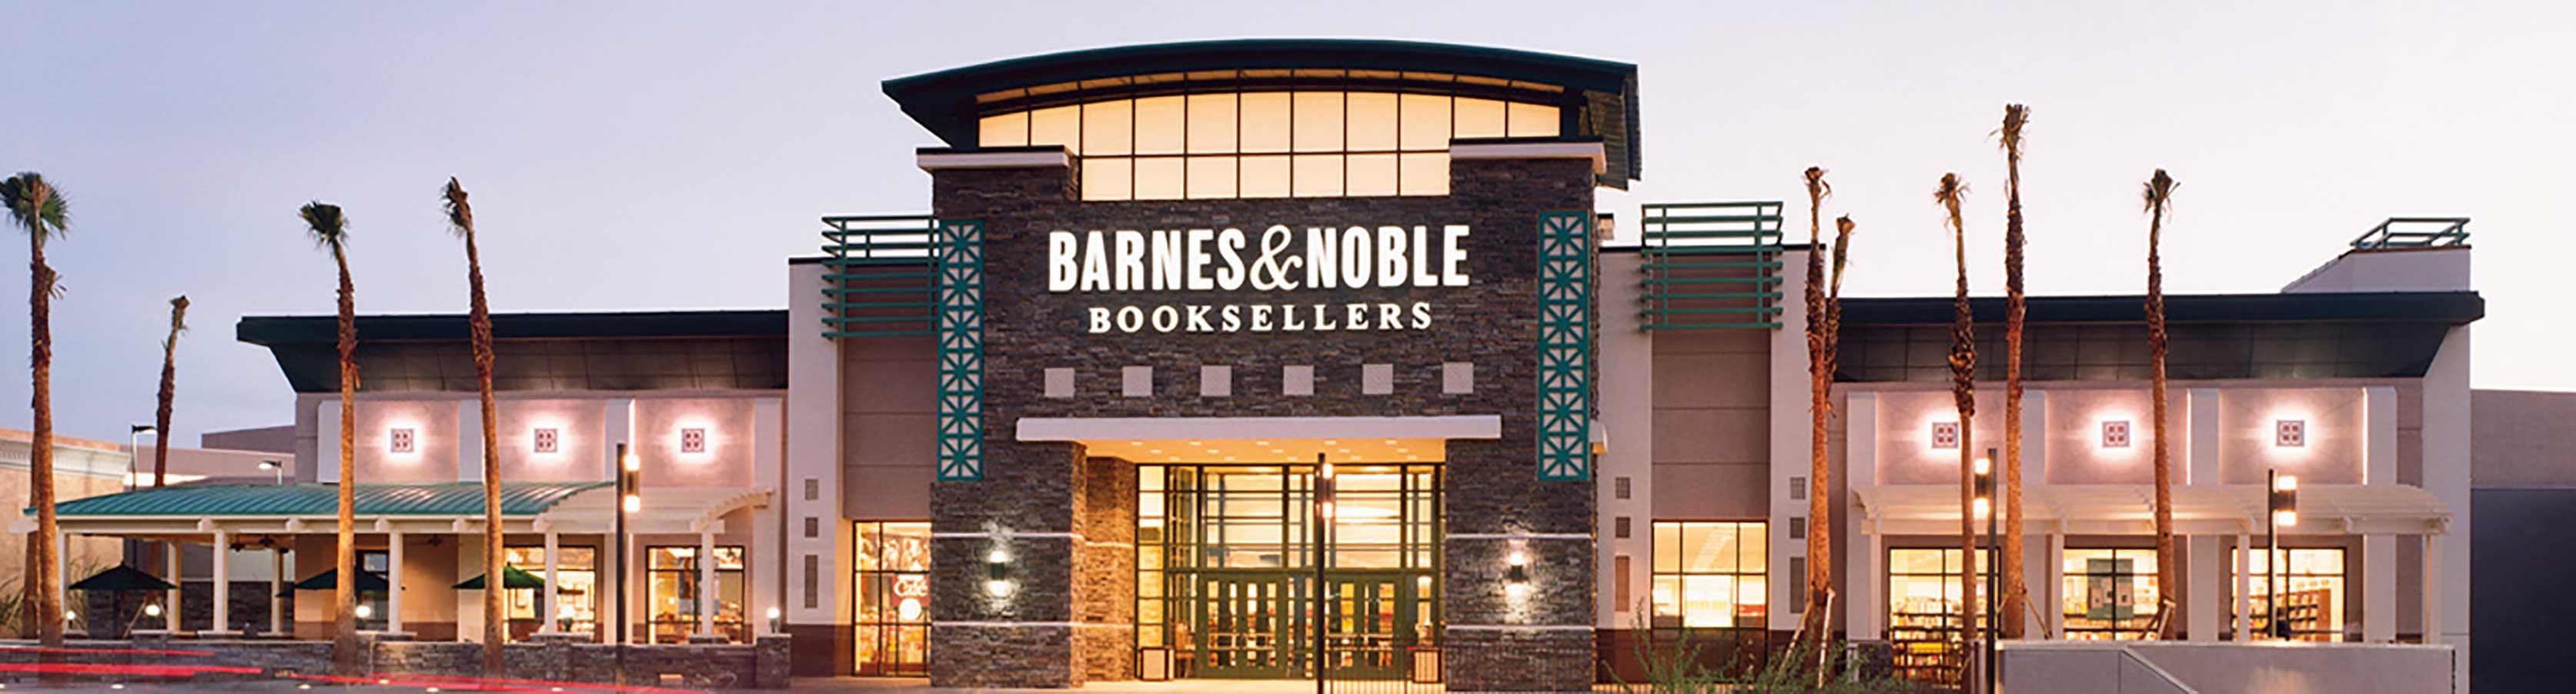 Barnes & Noble location.